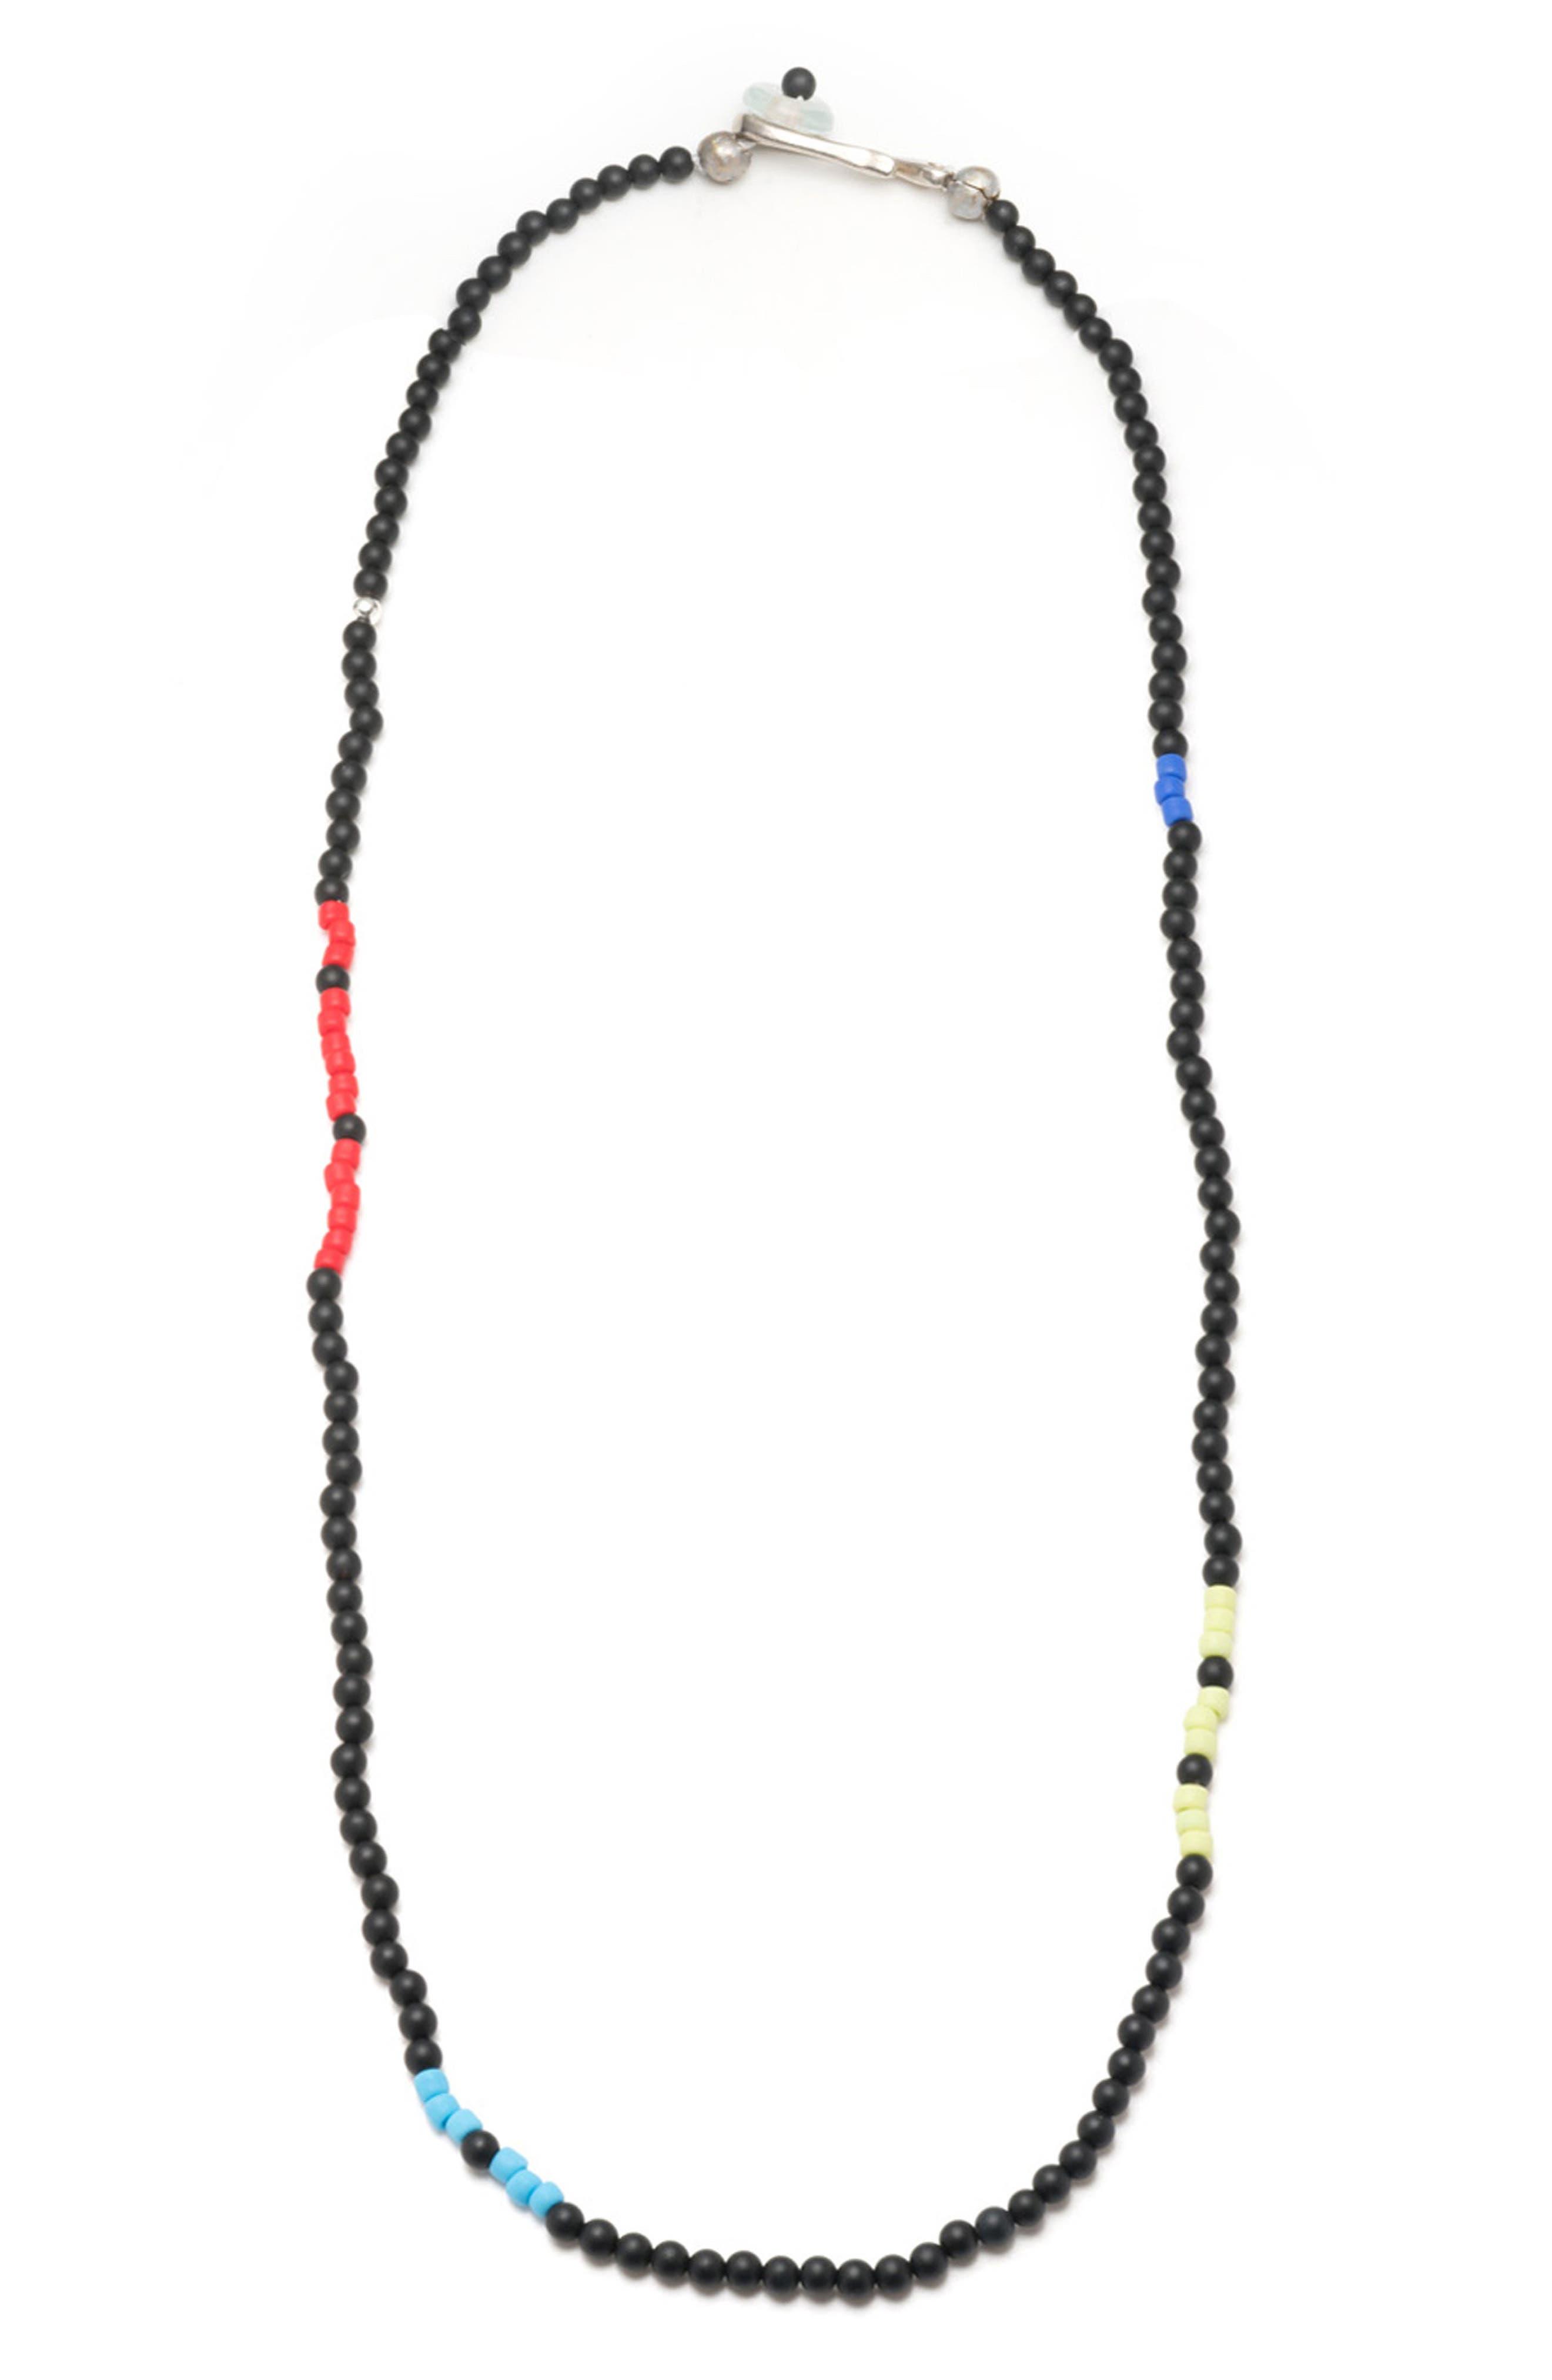 Wise Morse Necklace,                             Main thumbnail 1, color,                             Black/ Multi